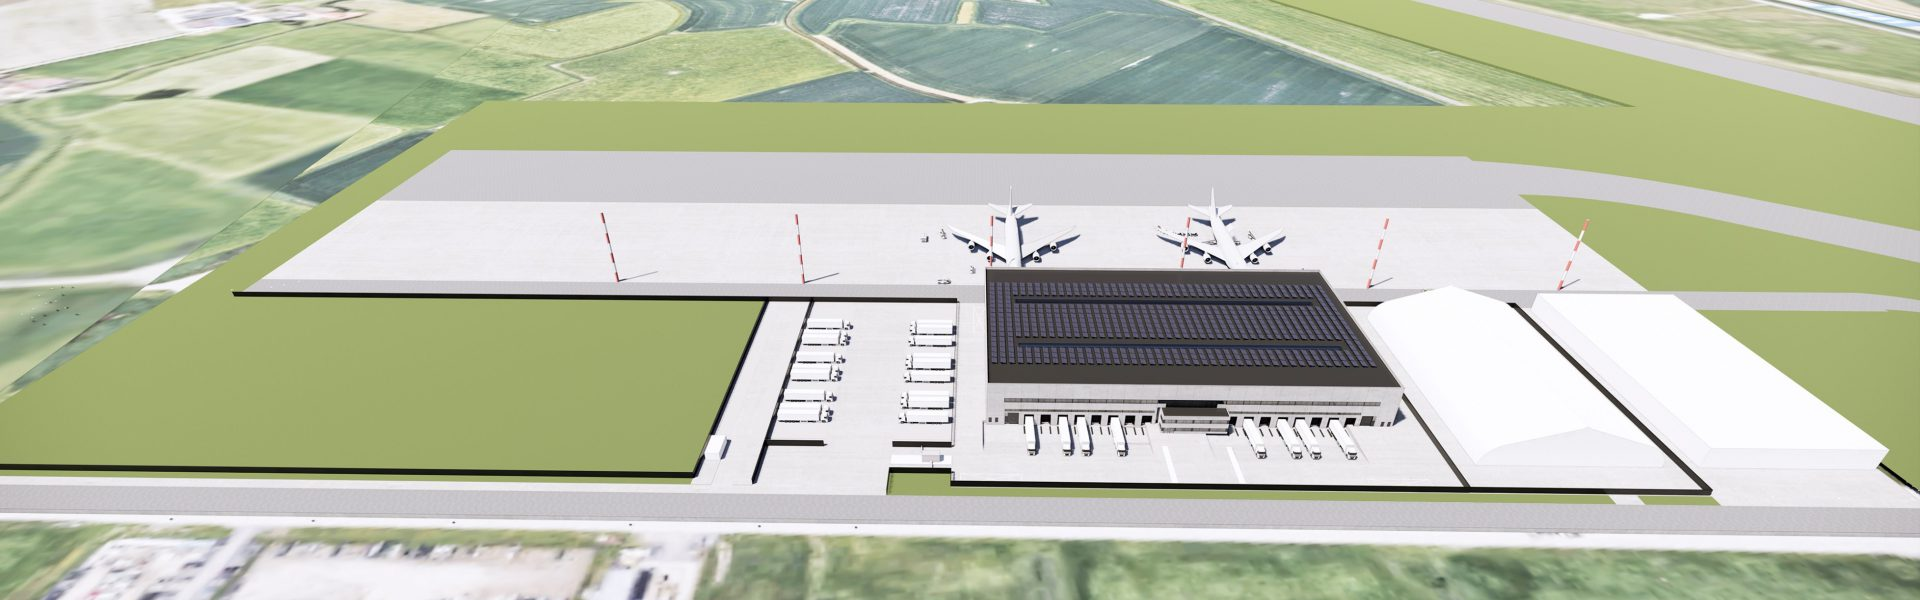 Versluys Logistics phase 1 A